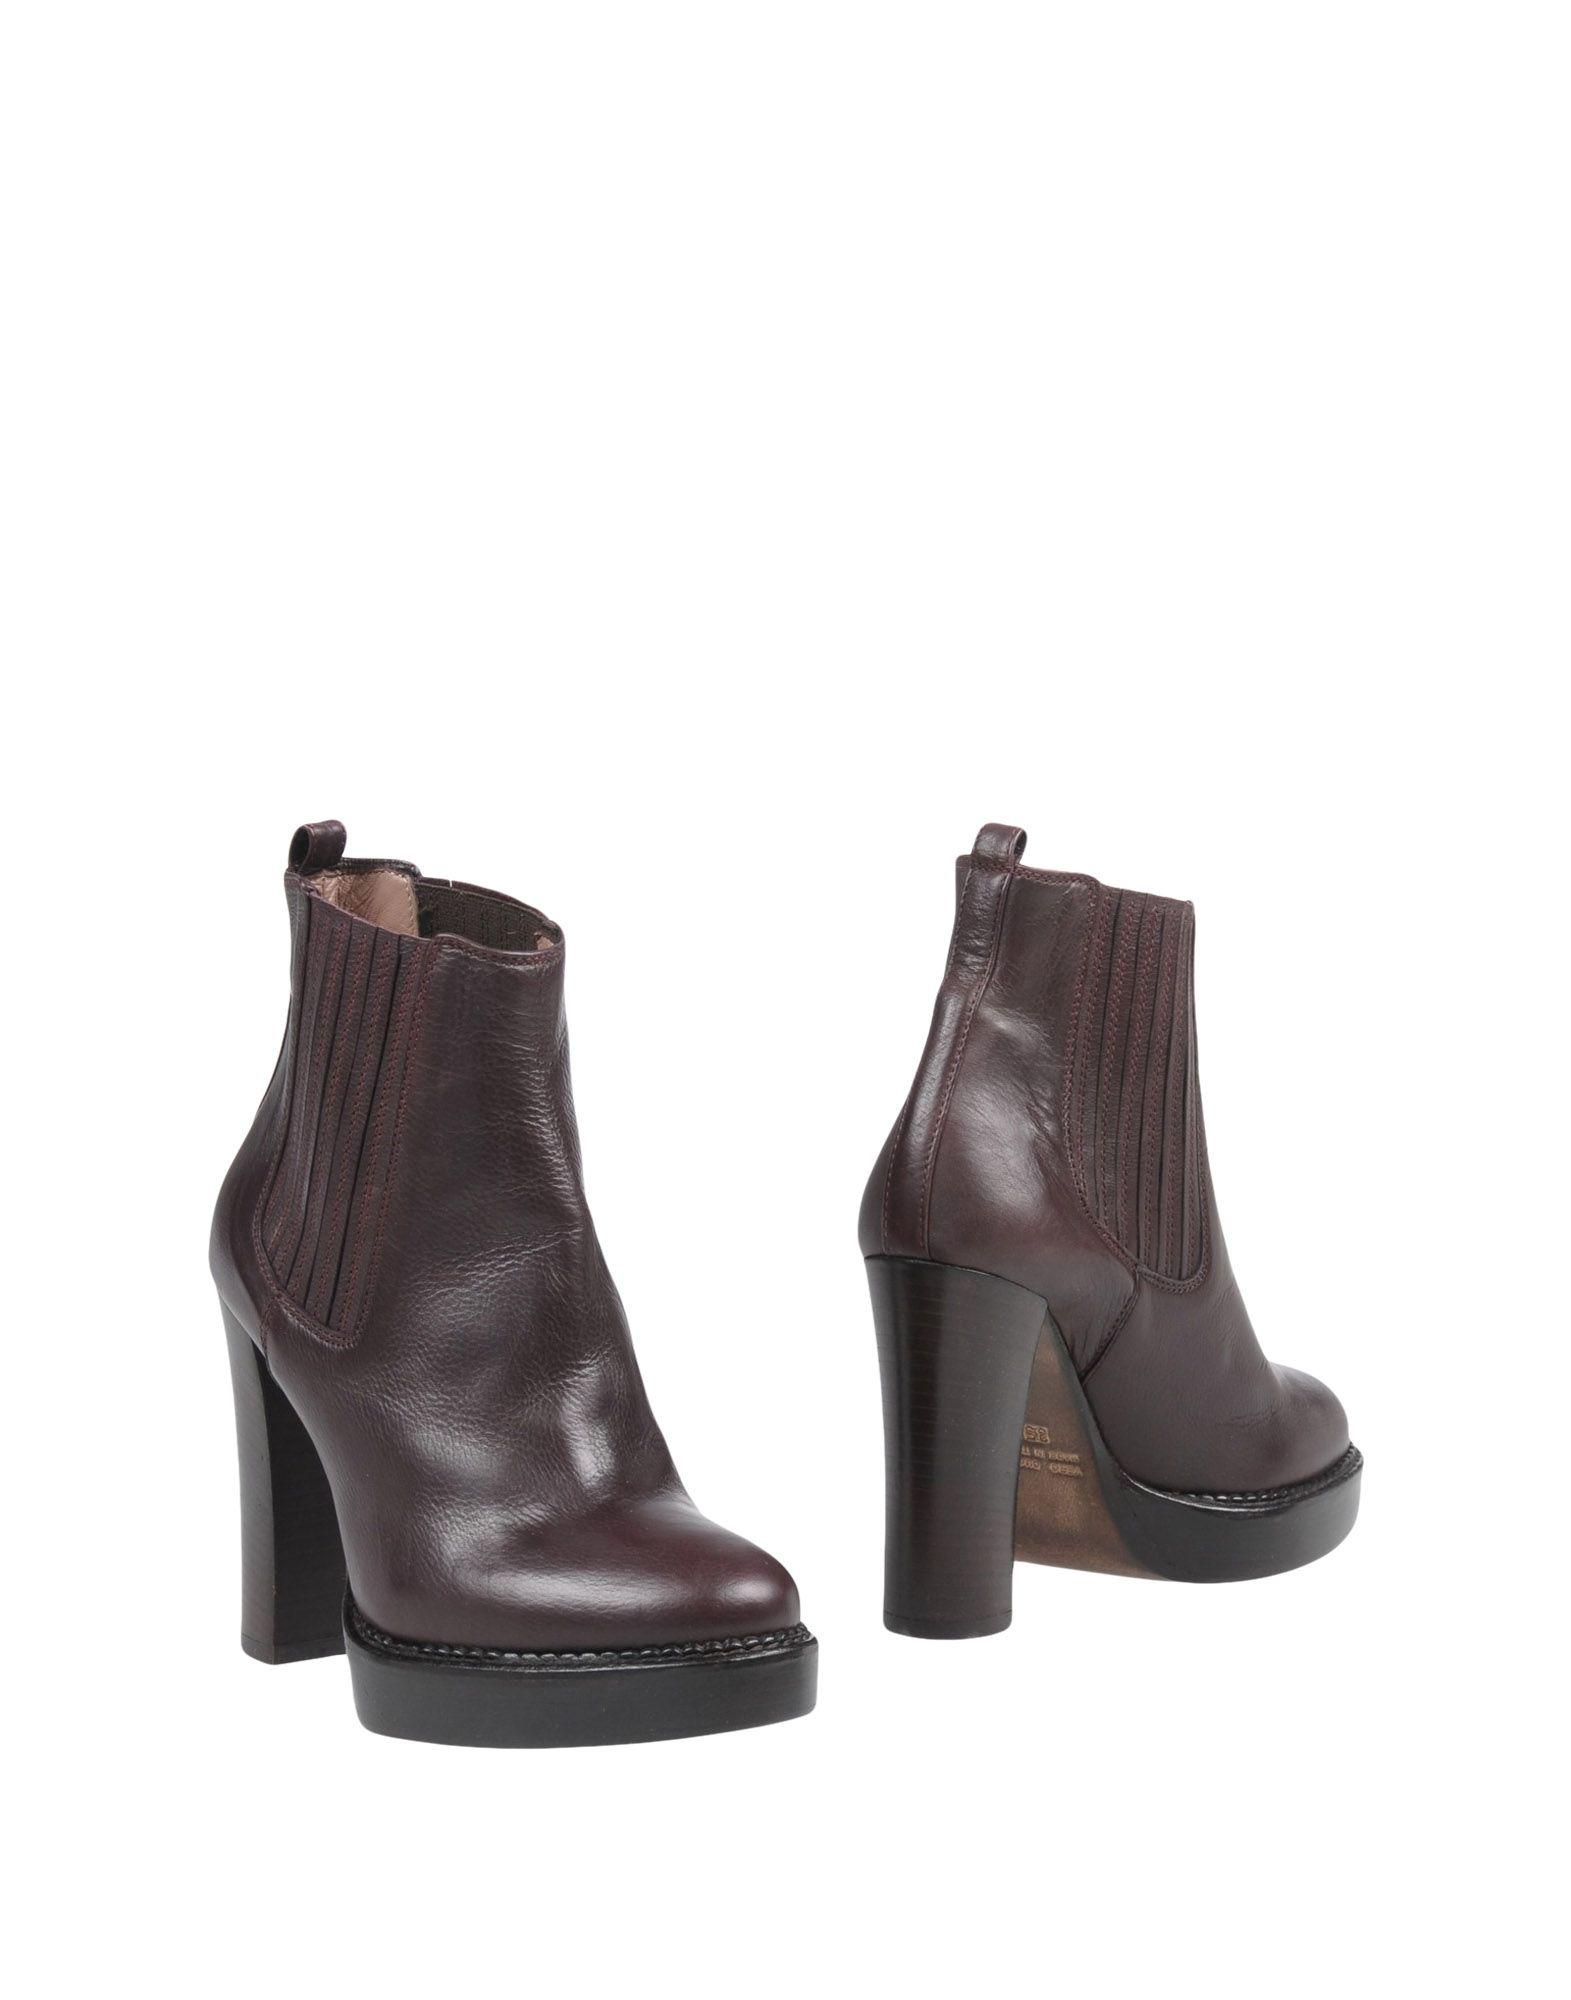 GARRICE Полусапоги и высокие ботинки just cavalli полусапоги и высокие ботинки